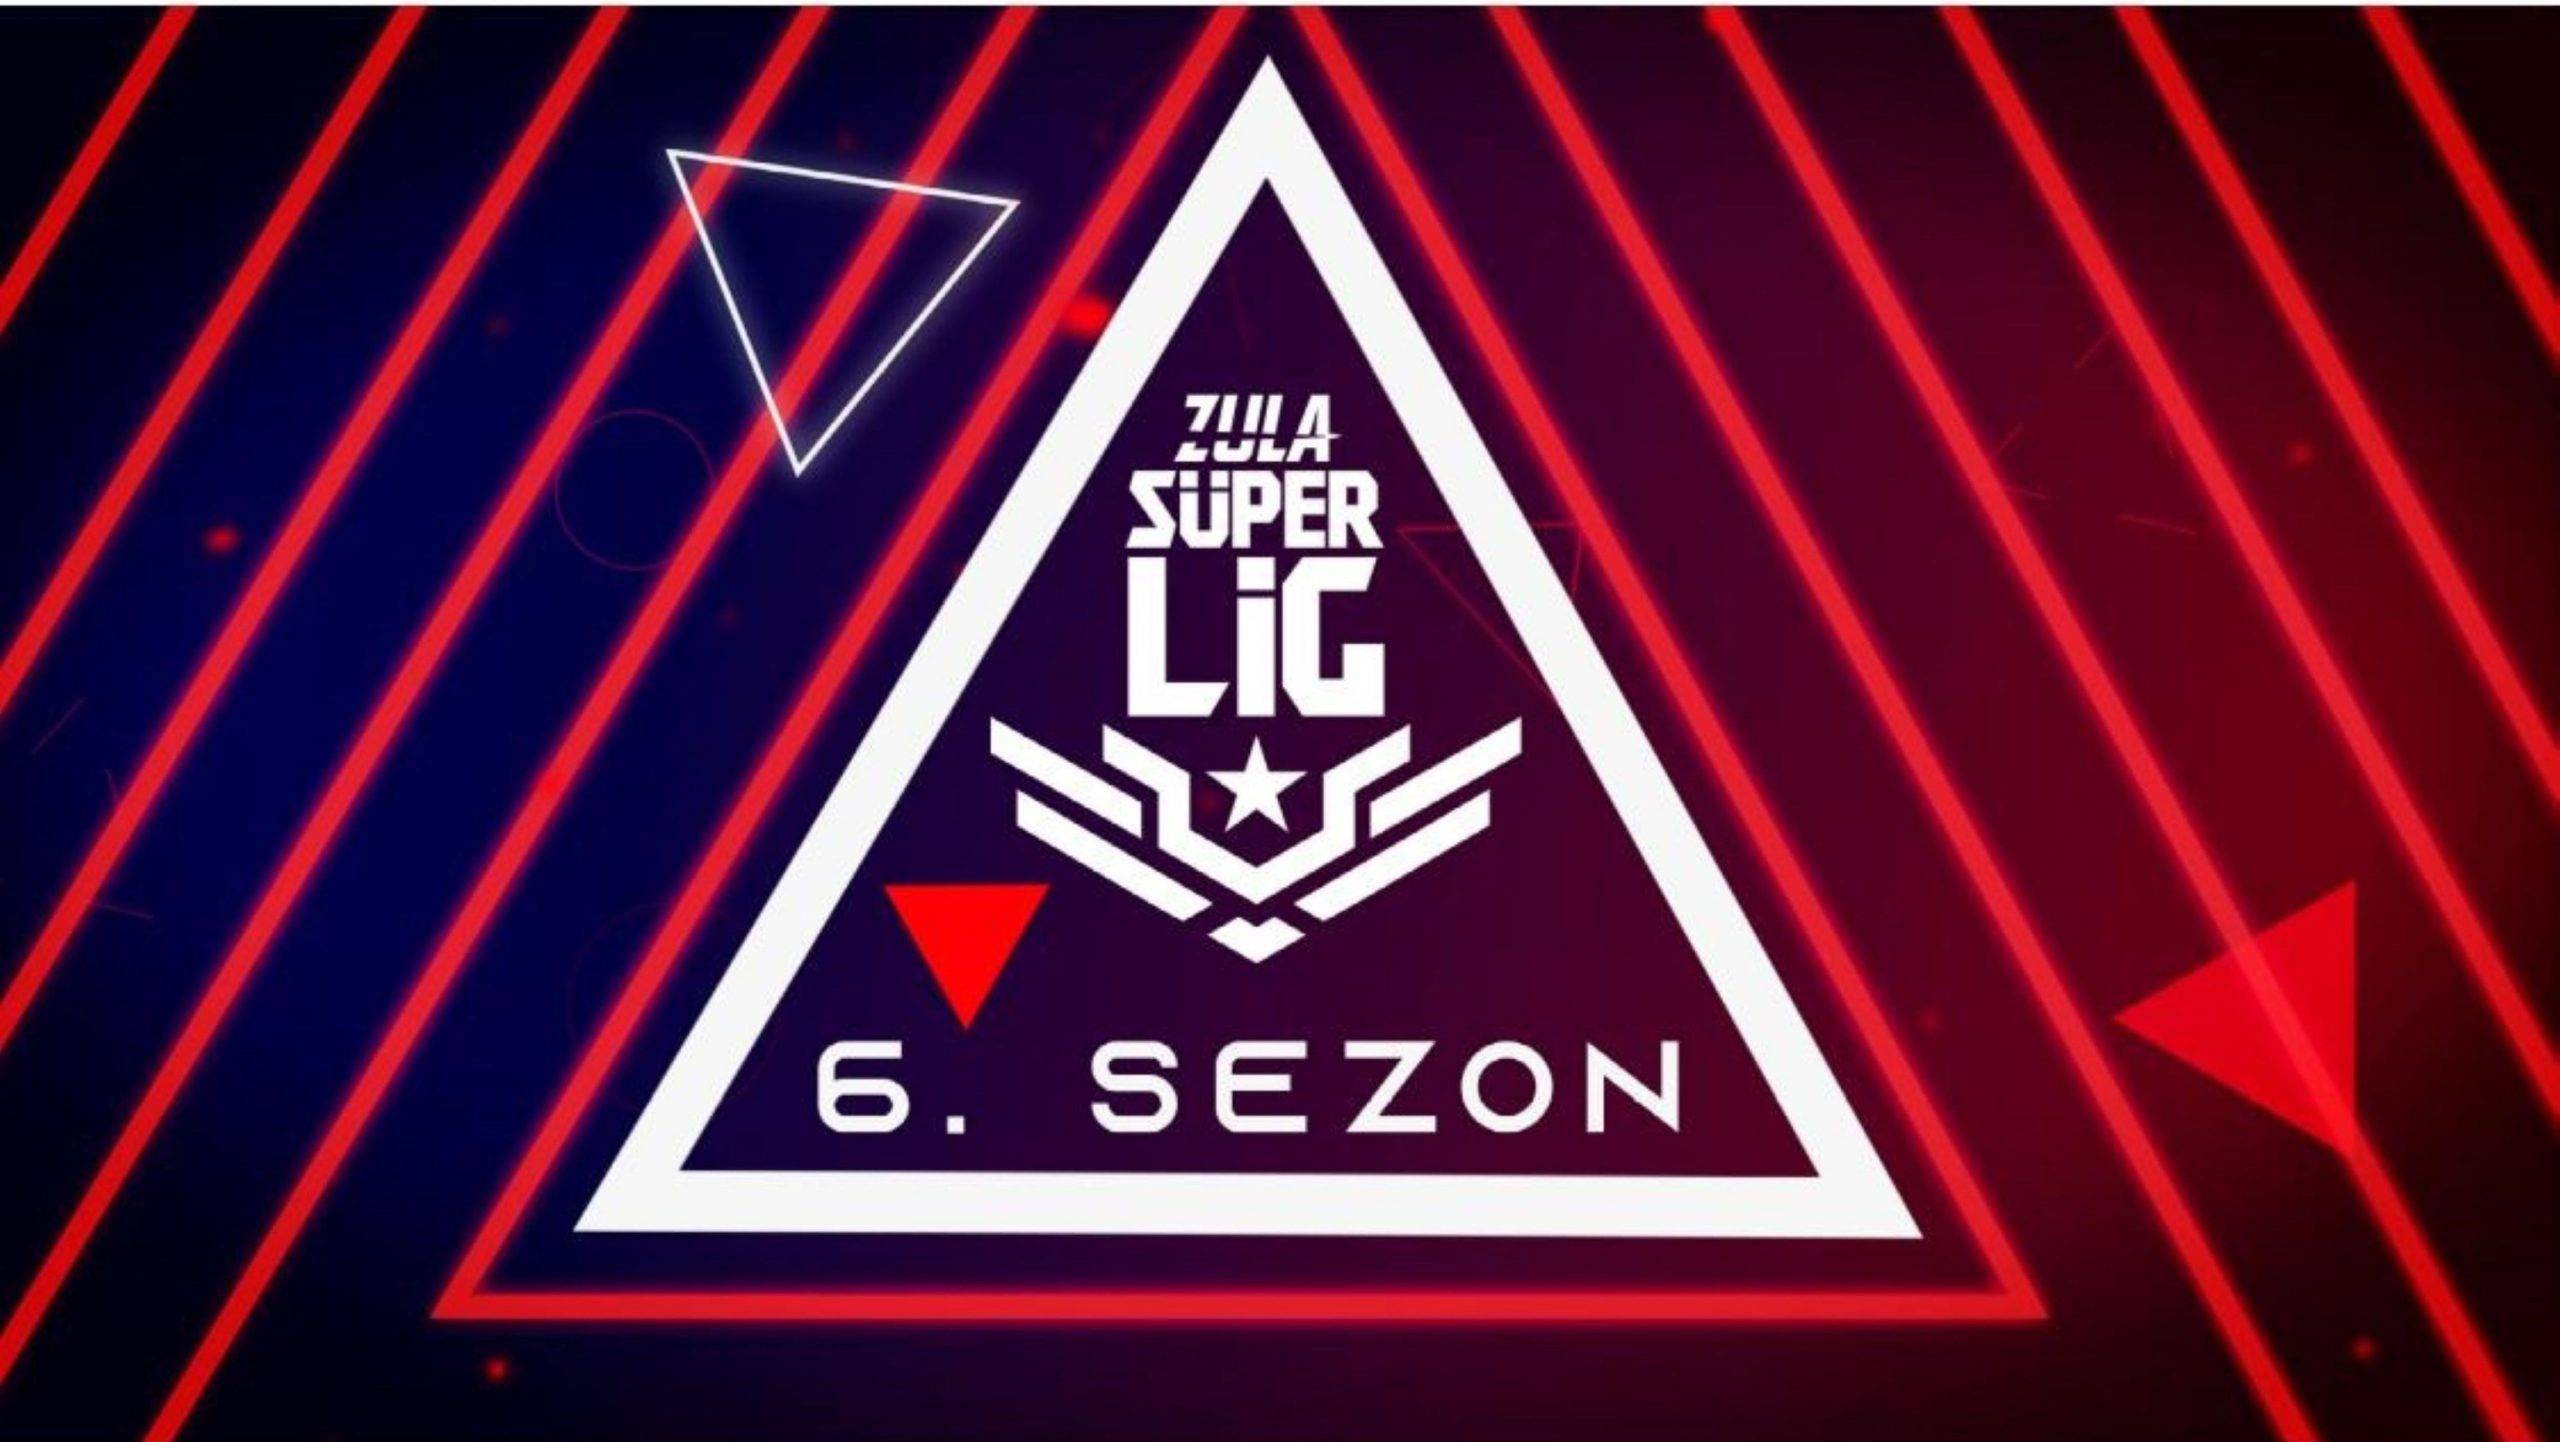 SUPER LIG 6. SEZON scaled